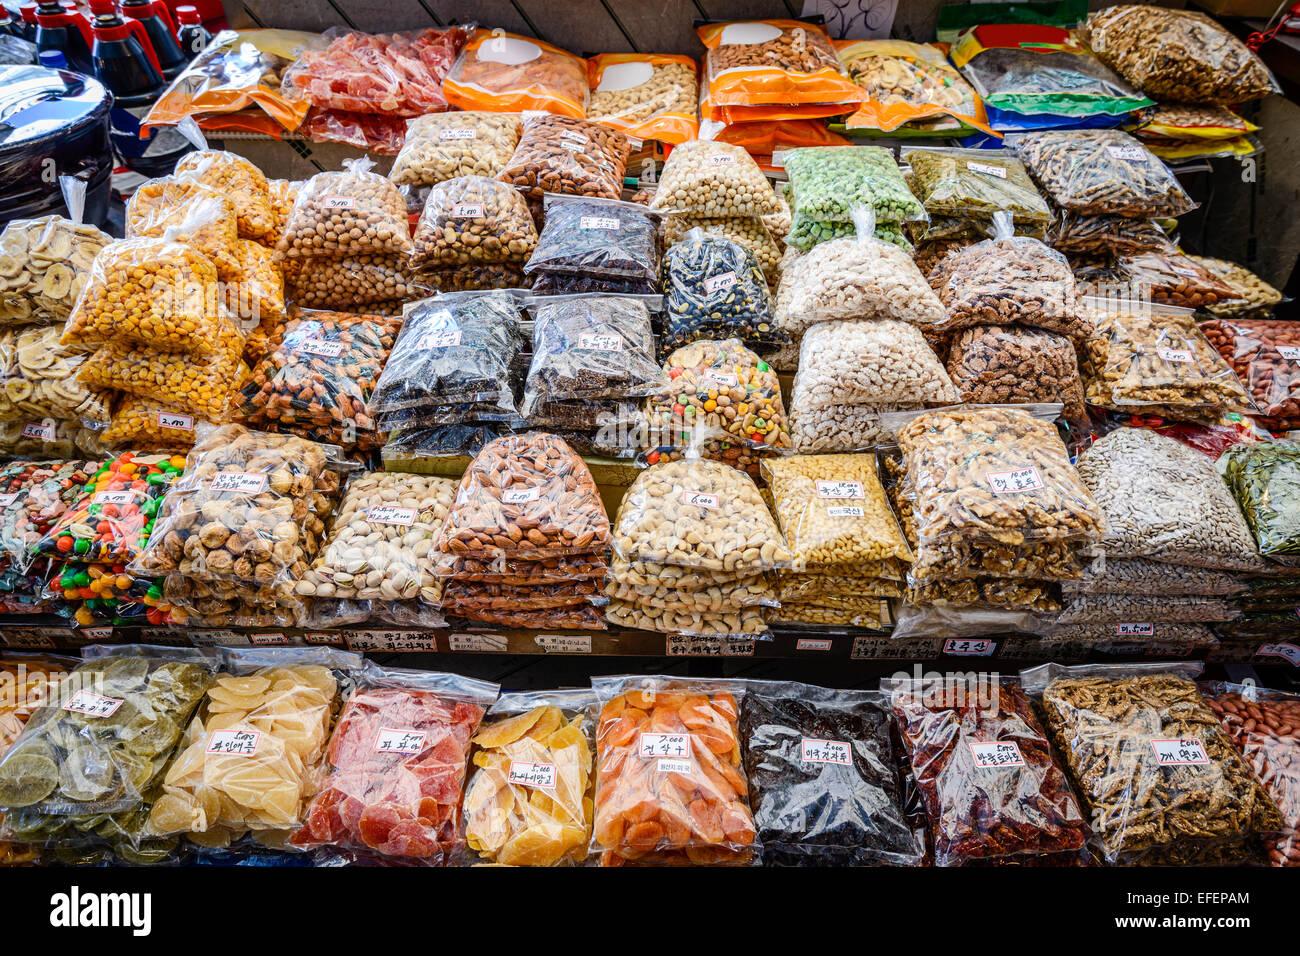 Packaged snacks at Gwangjang Market in Seoul, South Korea. - Stock Image